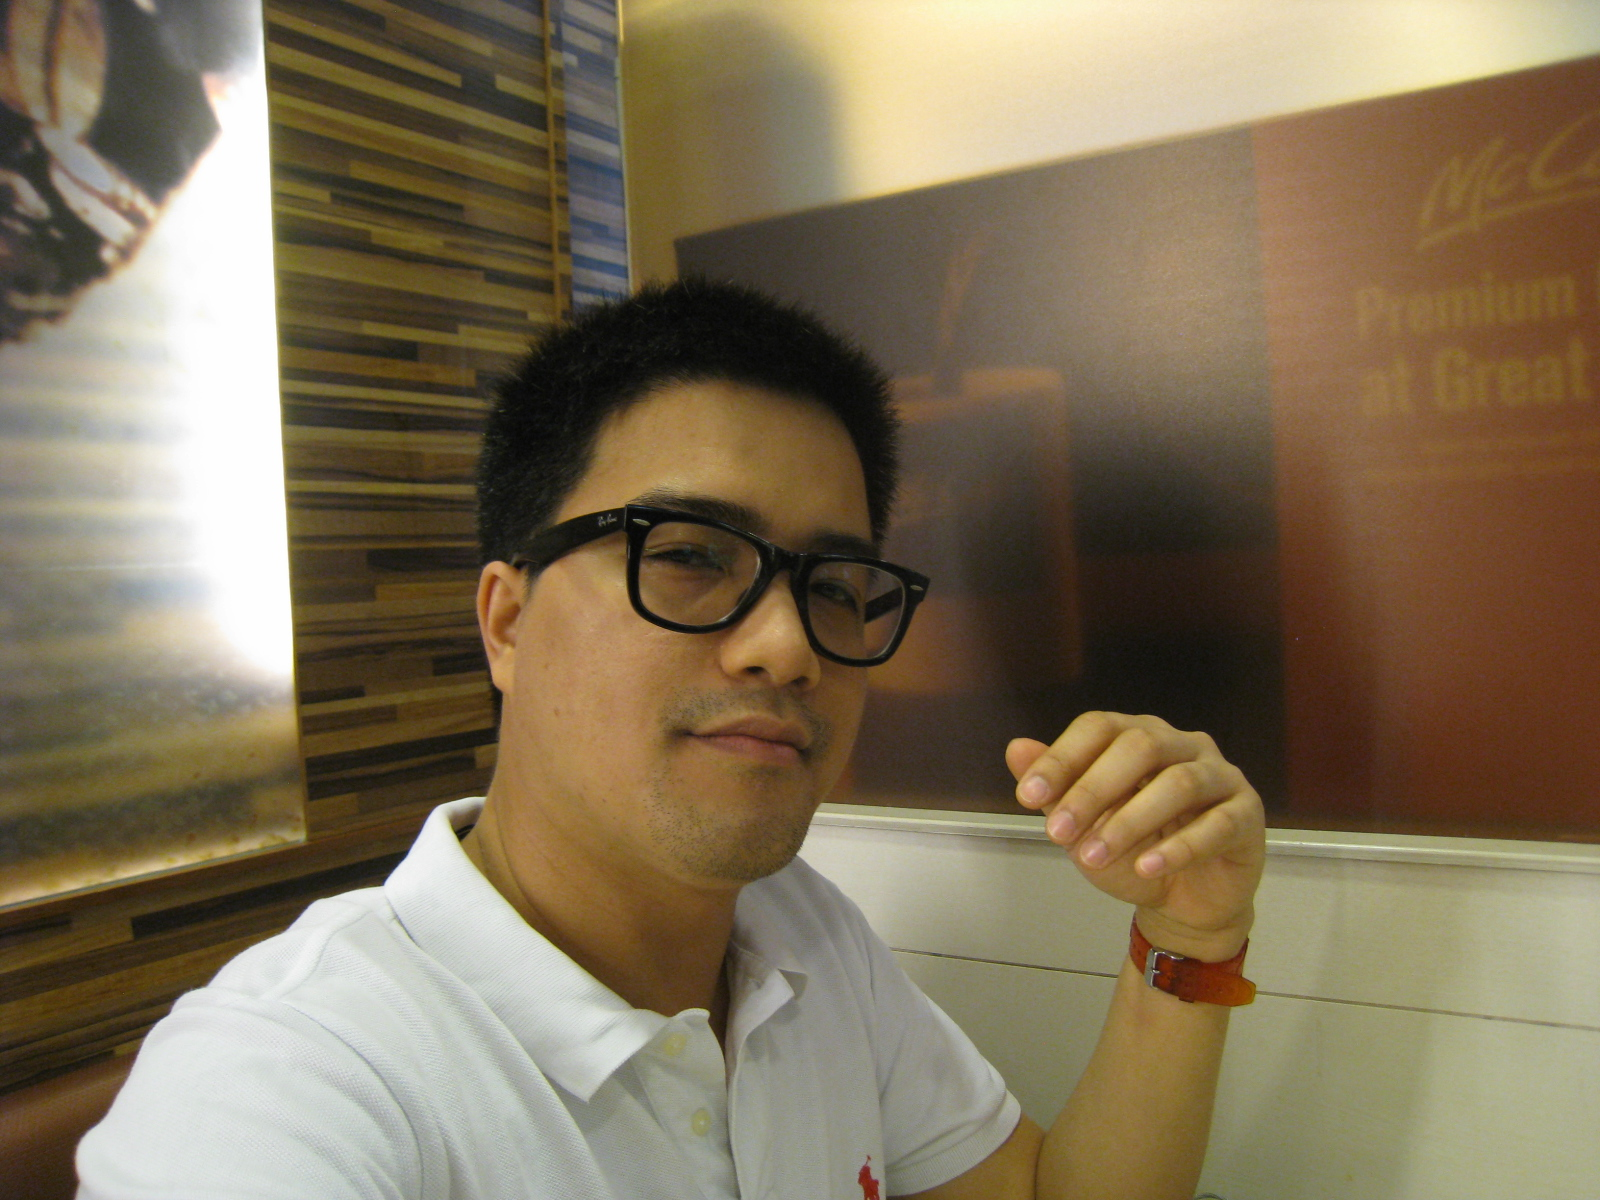 Bagong dating in english